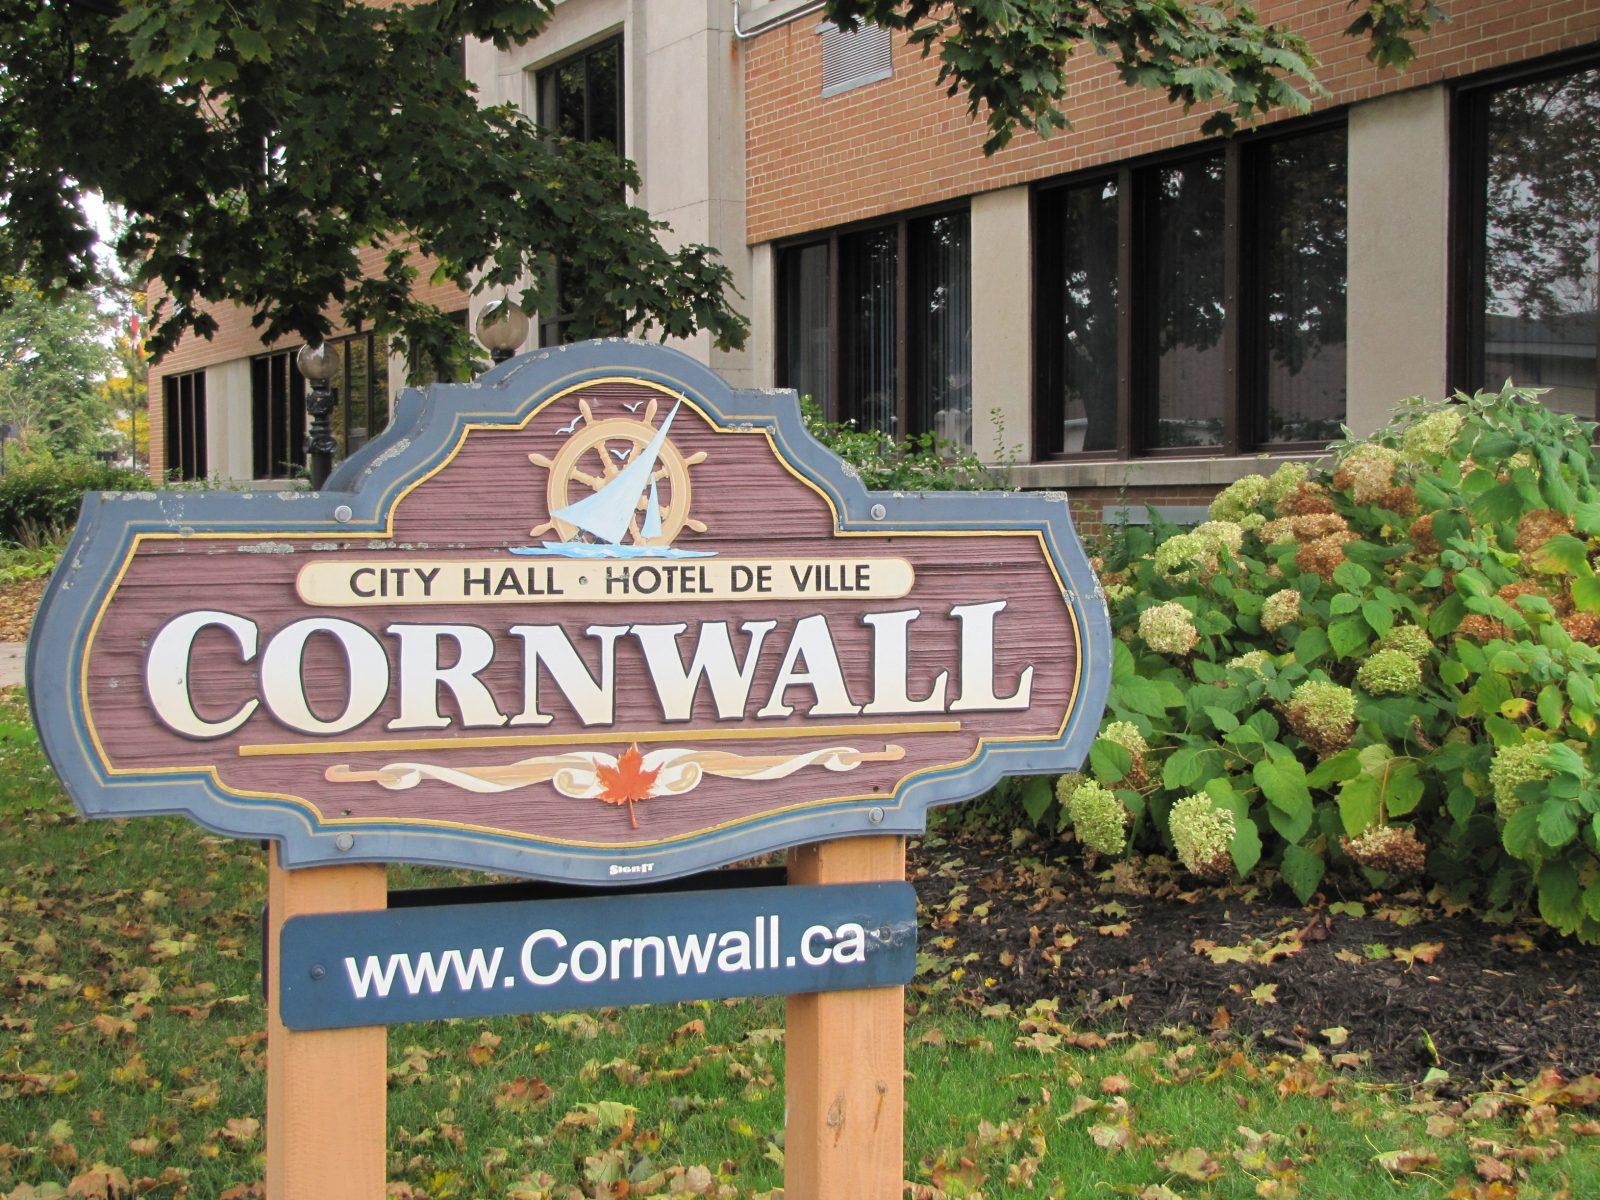 OPINION: Cornwall votes tomorrow make your voice heard!